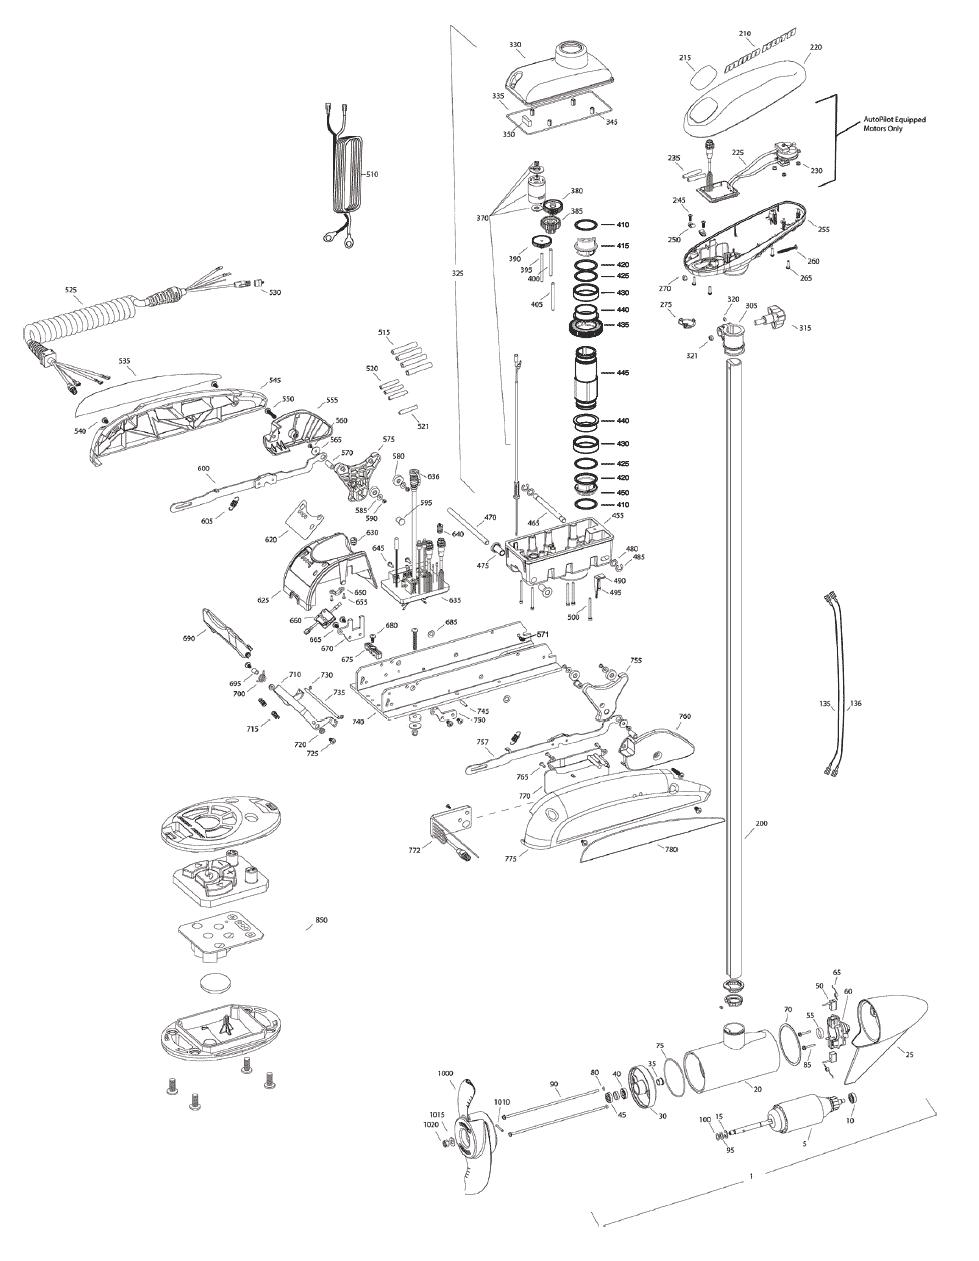 minn kota riptide terrova parts list reviewmotors cominn kota 12v wiring schematic diagram